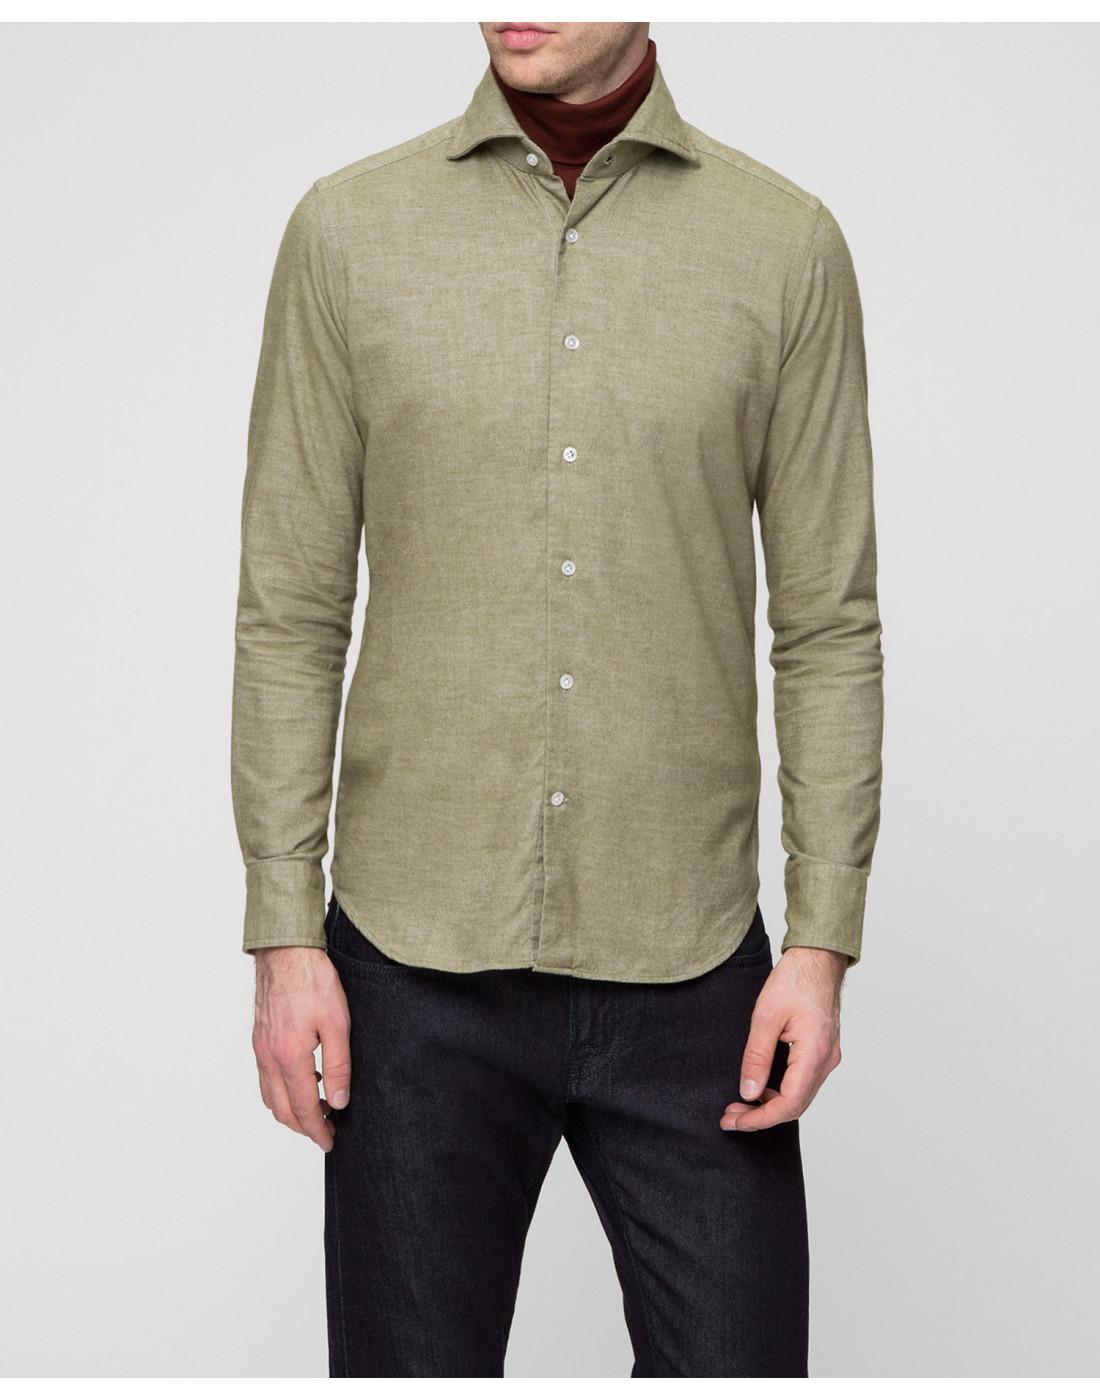 Мужская рубашка оливкового цвета Bagutta S08408.060-2